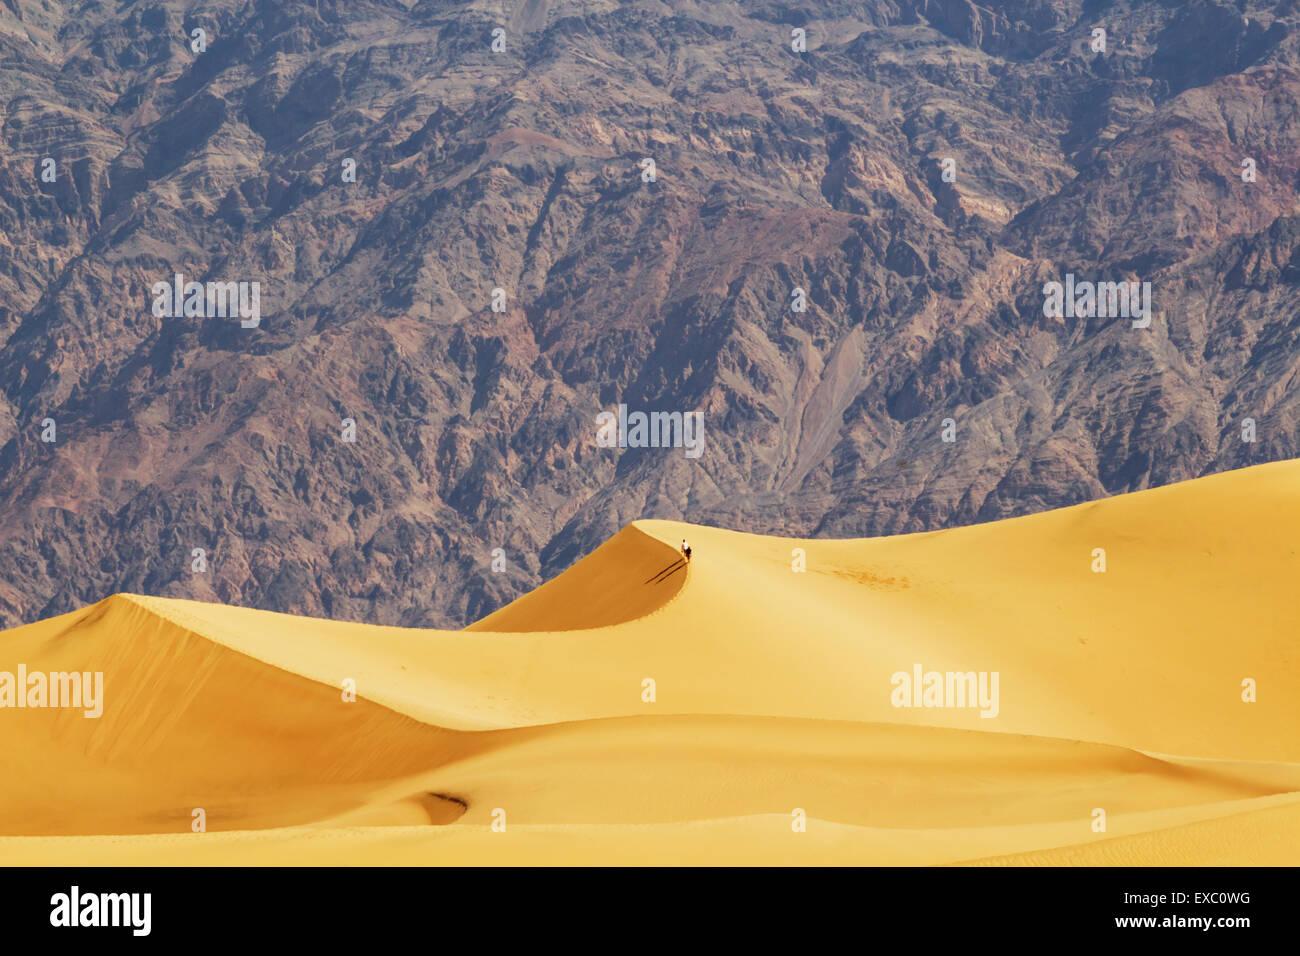 Mesquite sand dunes, Death Valley, California, USA Photo Stock